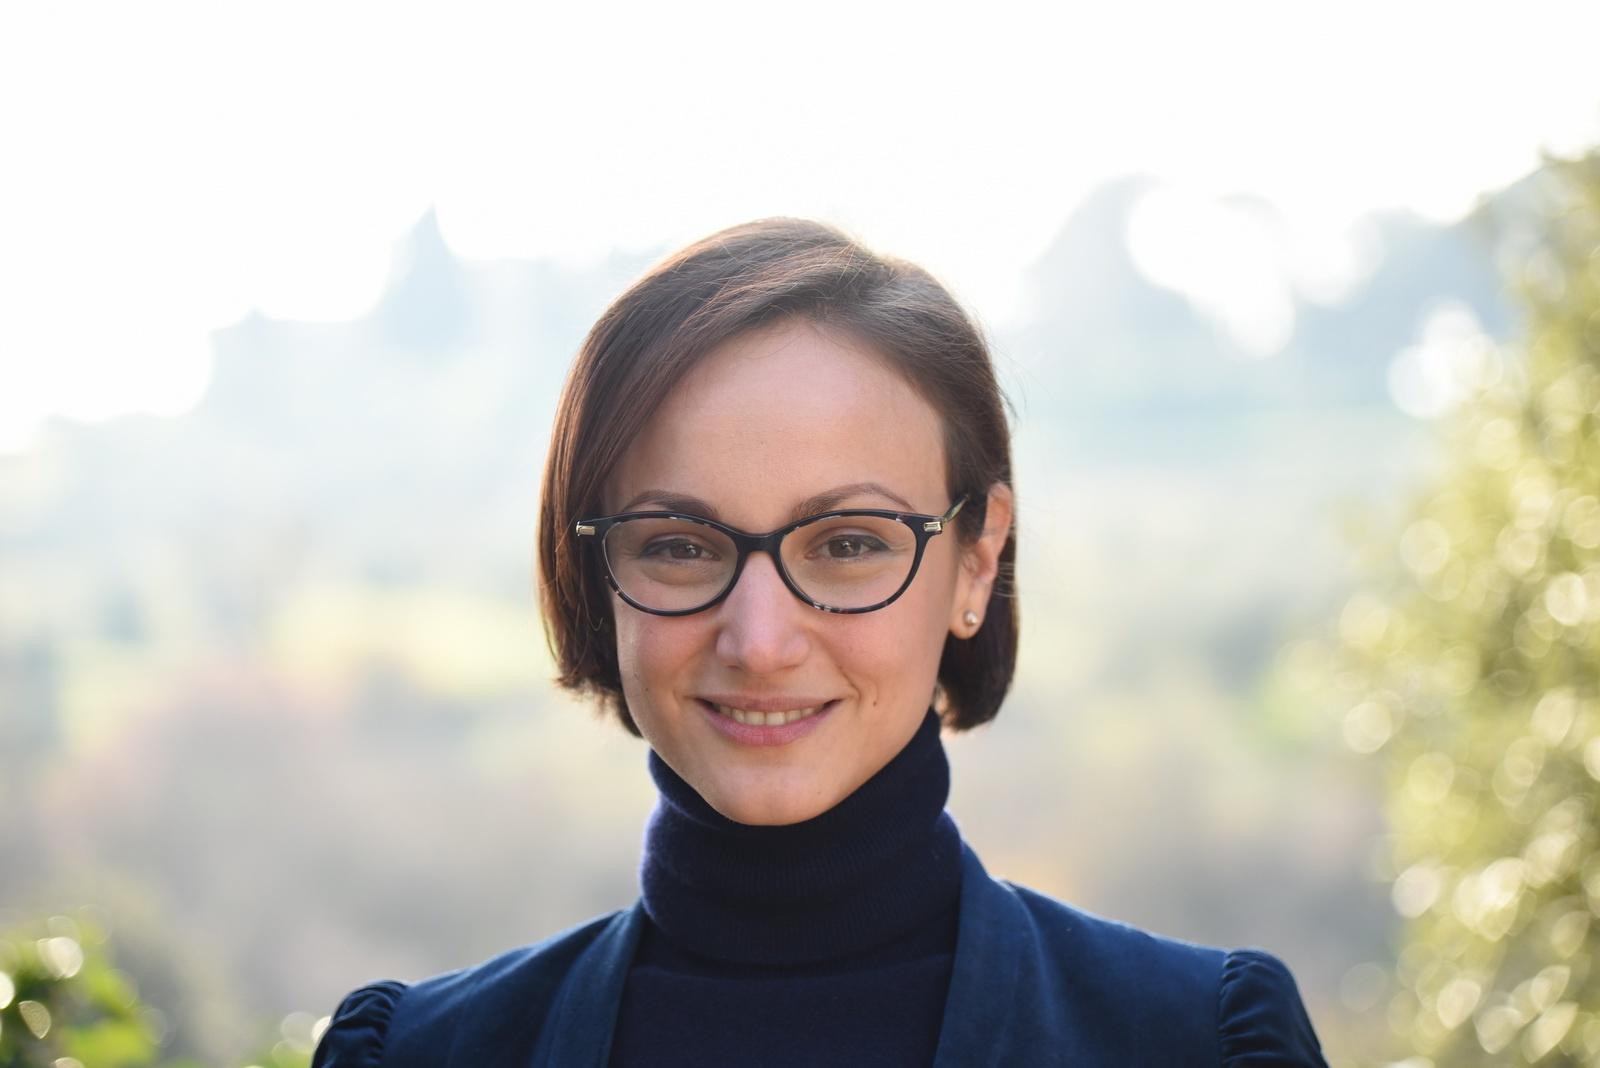 Giulia Accornero